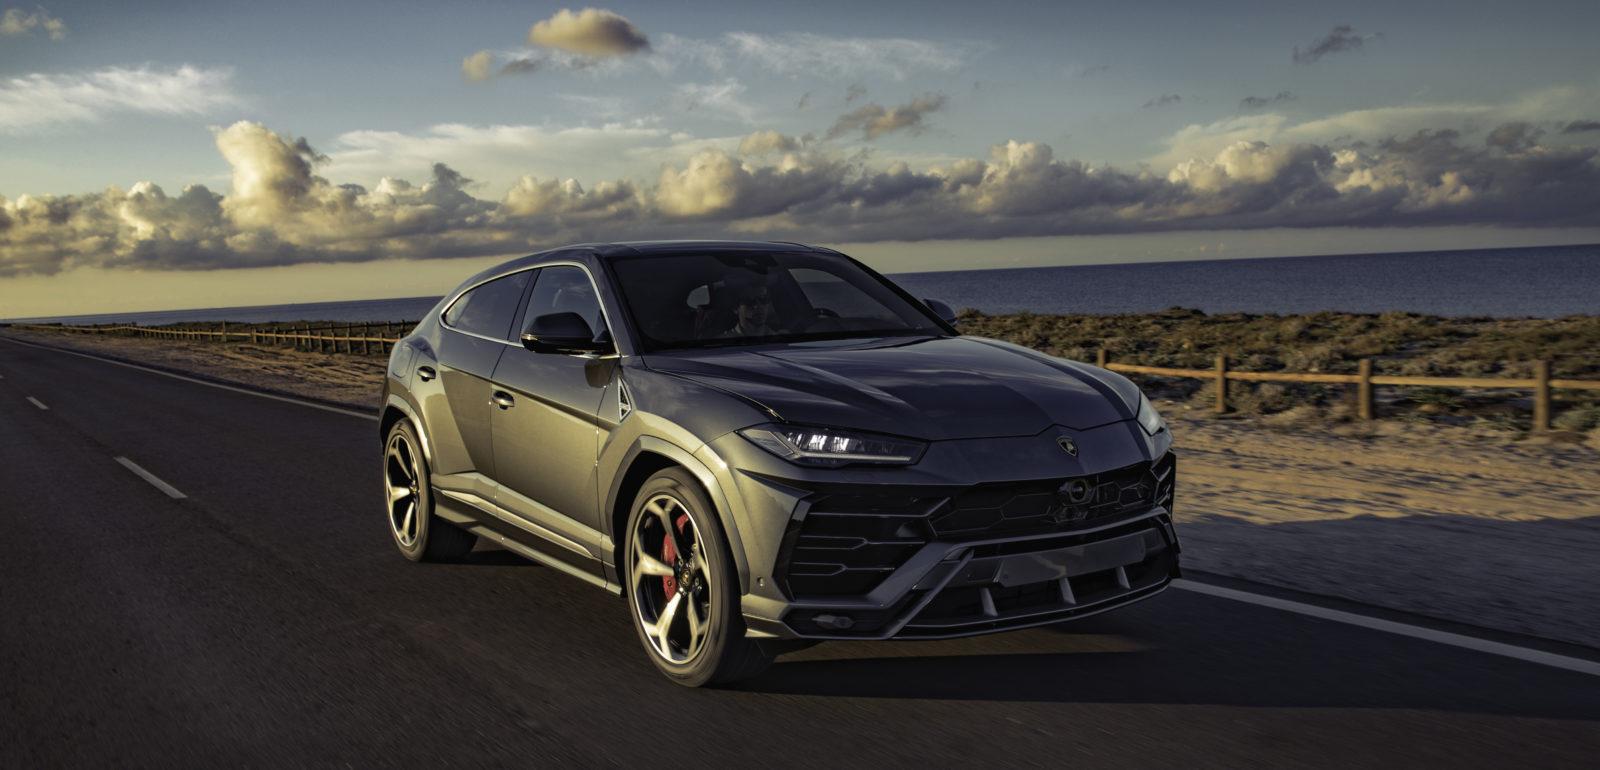 Lamborghini Urus A Game Changer